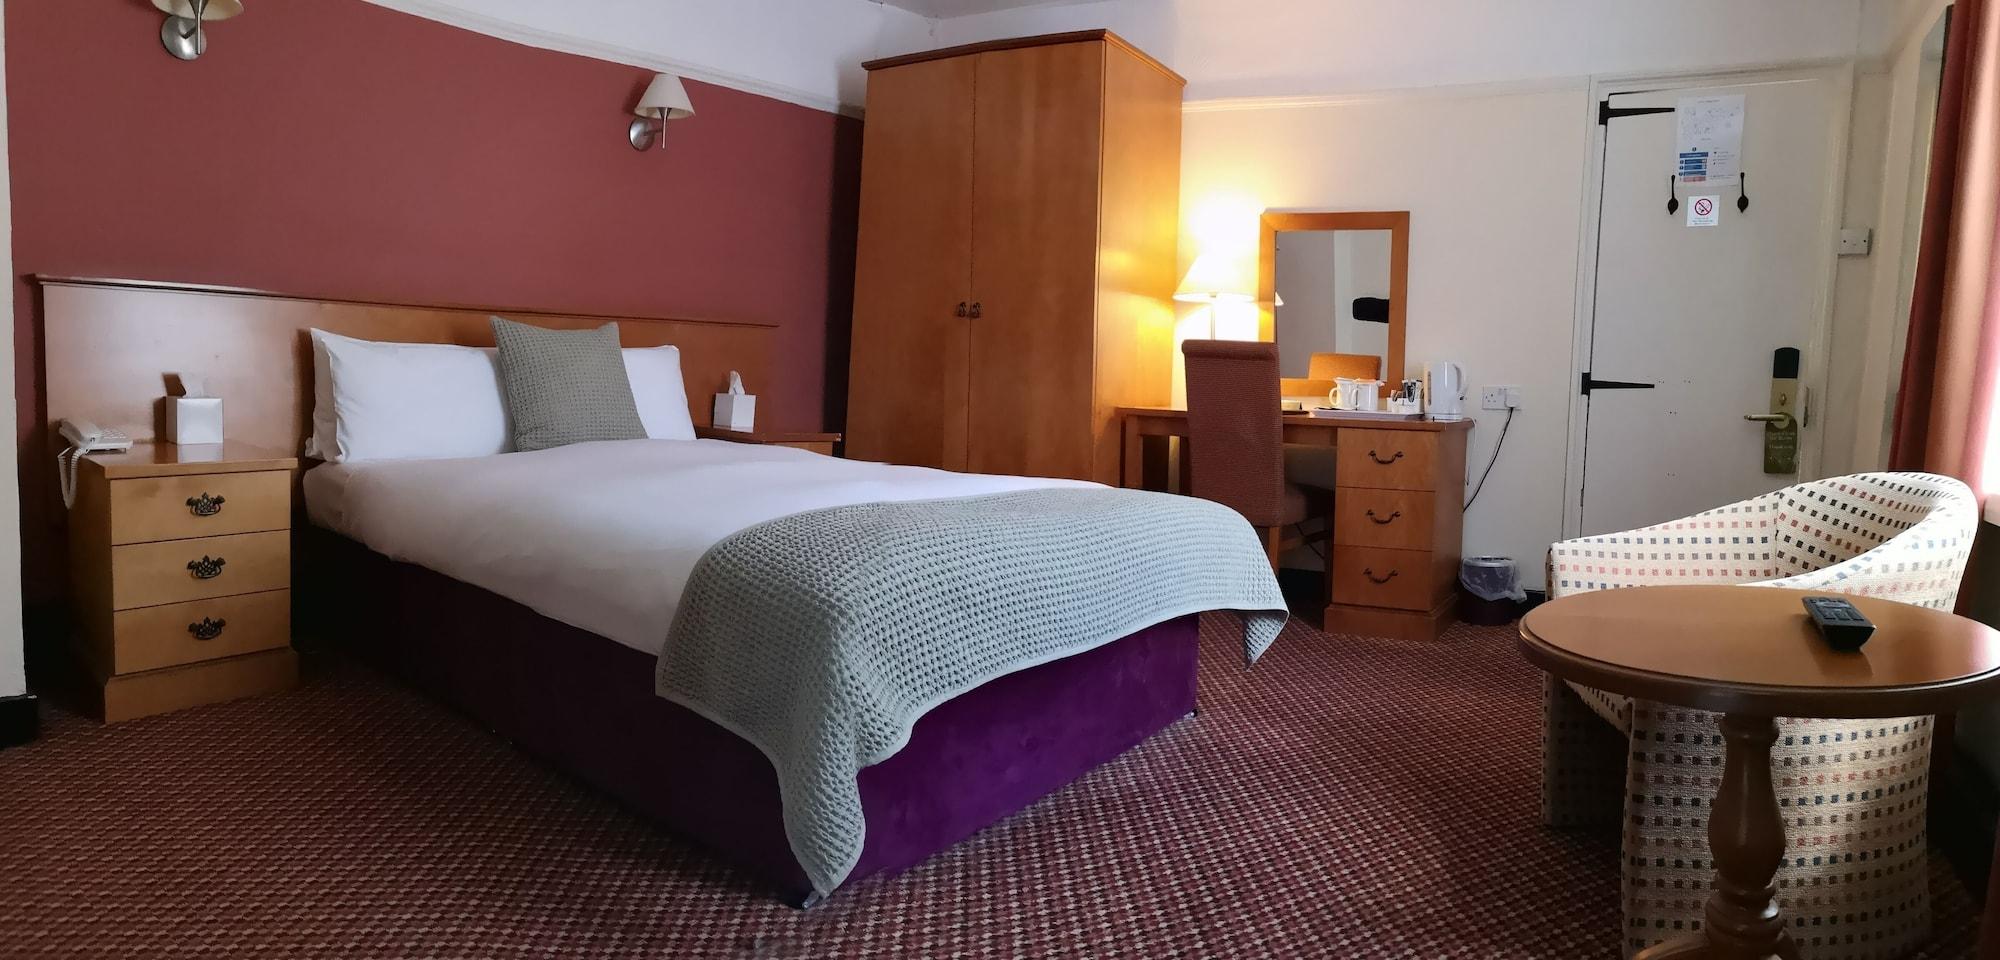 Tudor Lodge Hotel, London